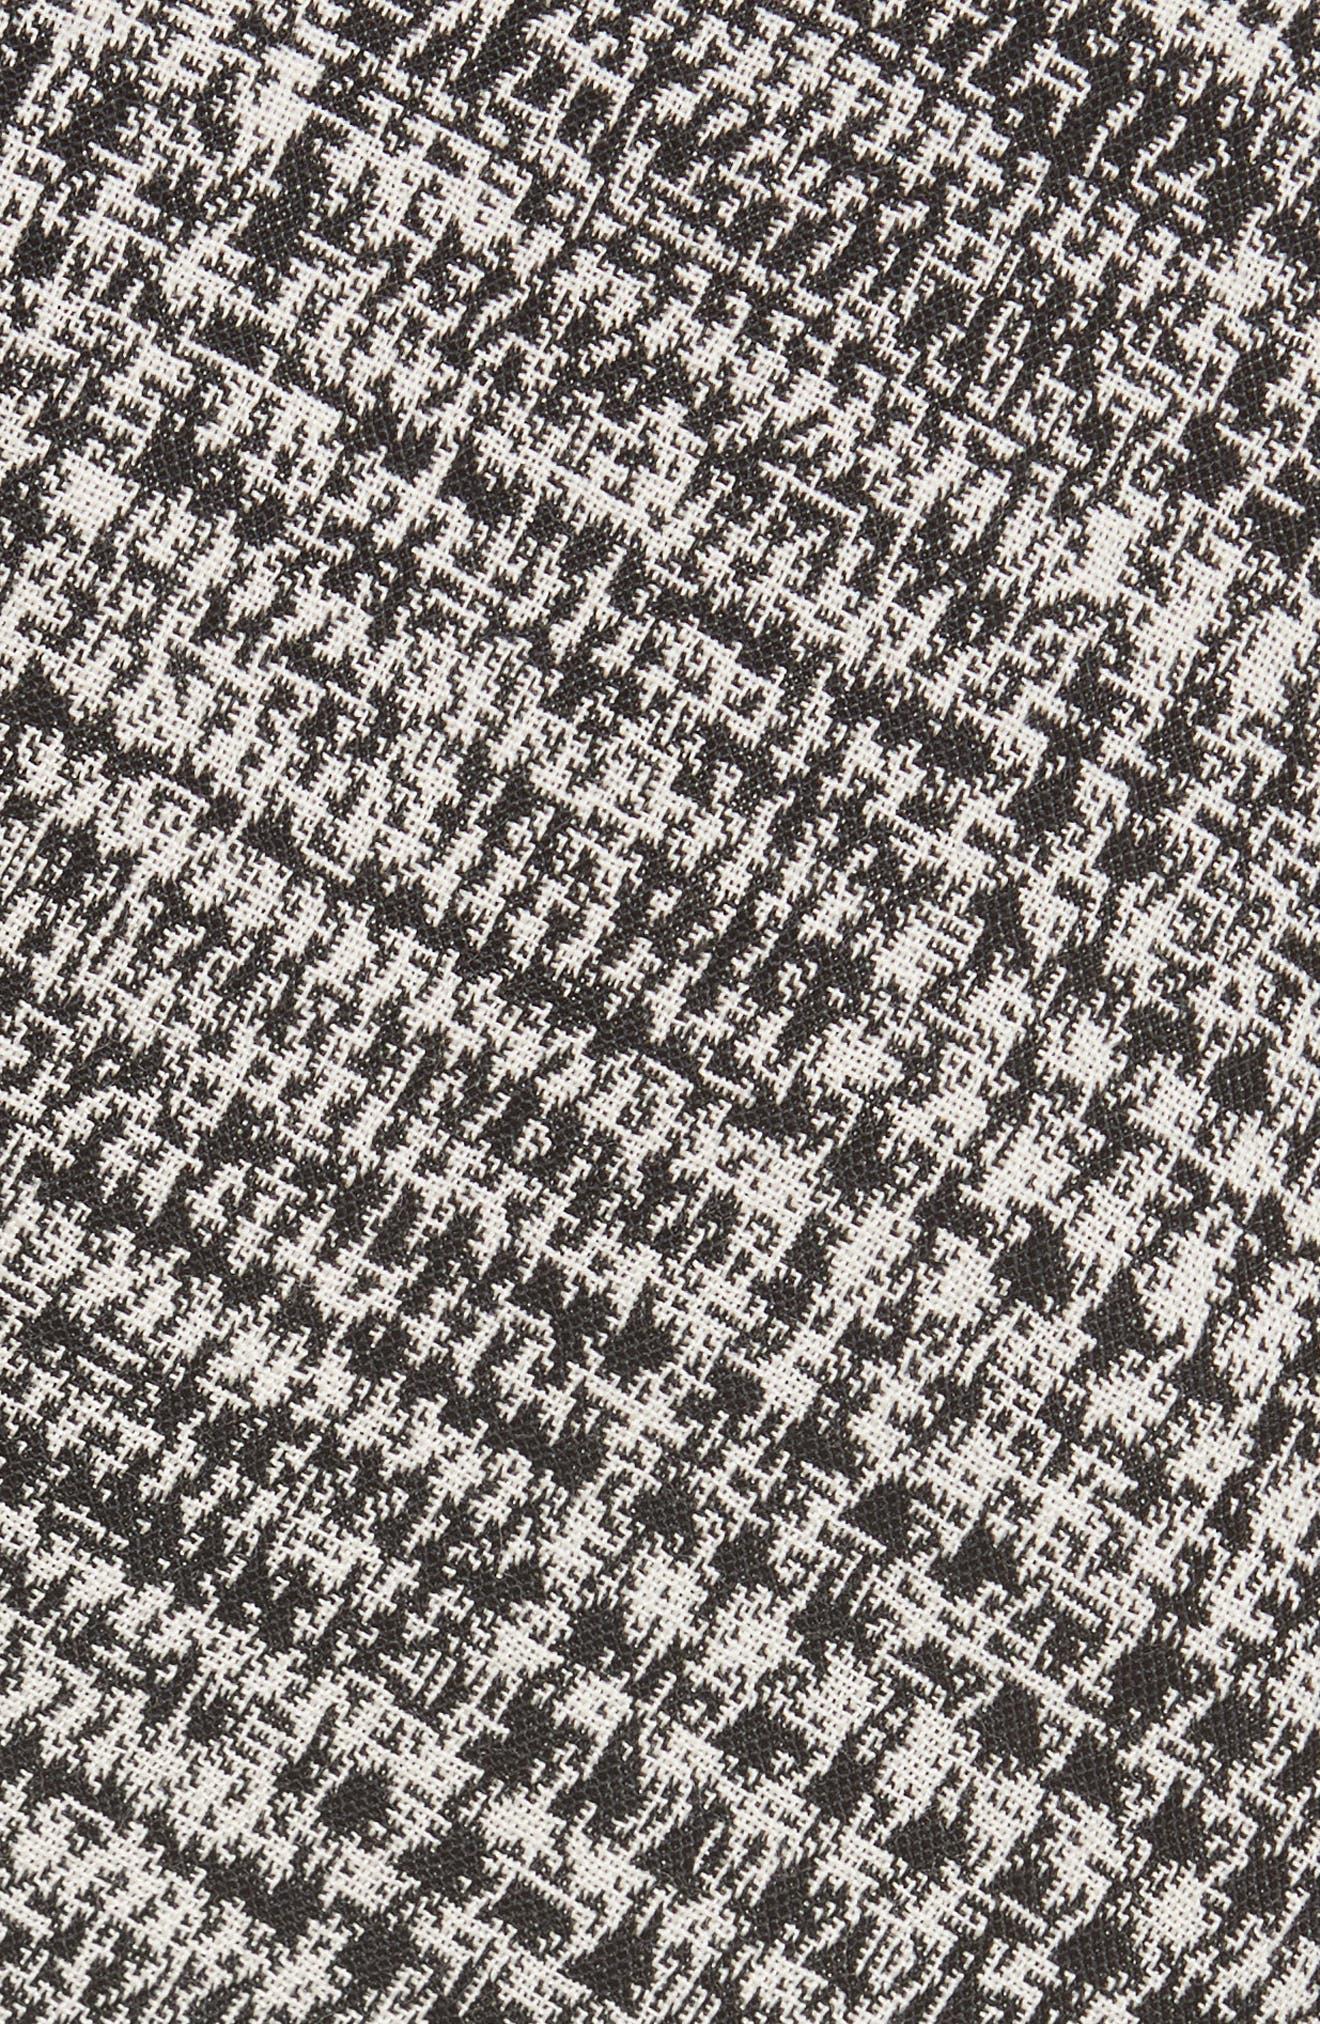 JASON WU COLLECTION,                             Jason Wu Check Wool Fit & Flare Dress,                             Alternate thumbnail 5, color,                             001